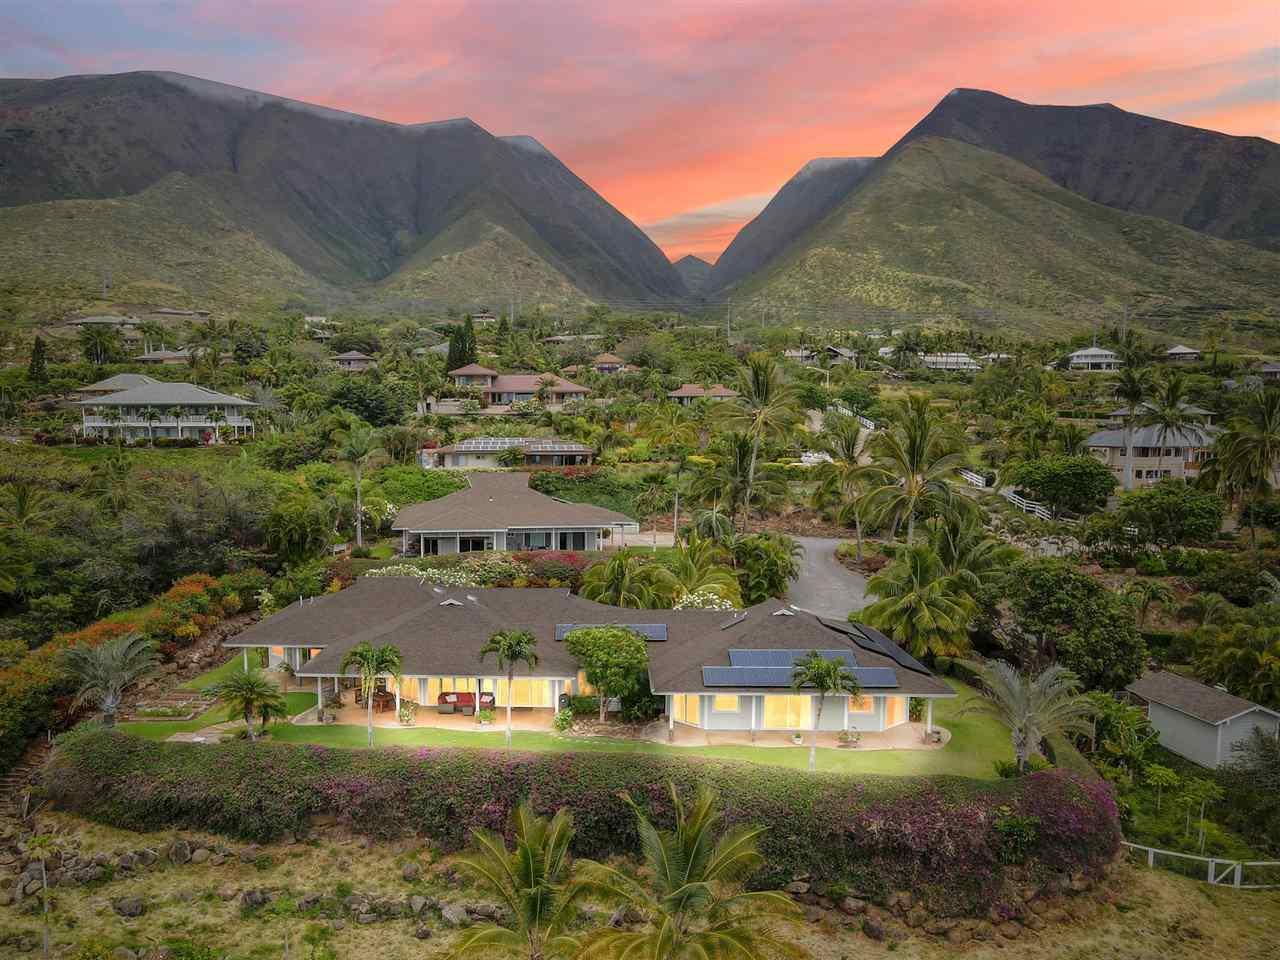 $3,700,000 - 4Br/4Ba -  for Sale in Mahanalua Nui, Lahaina